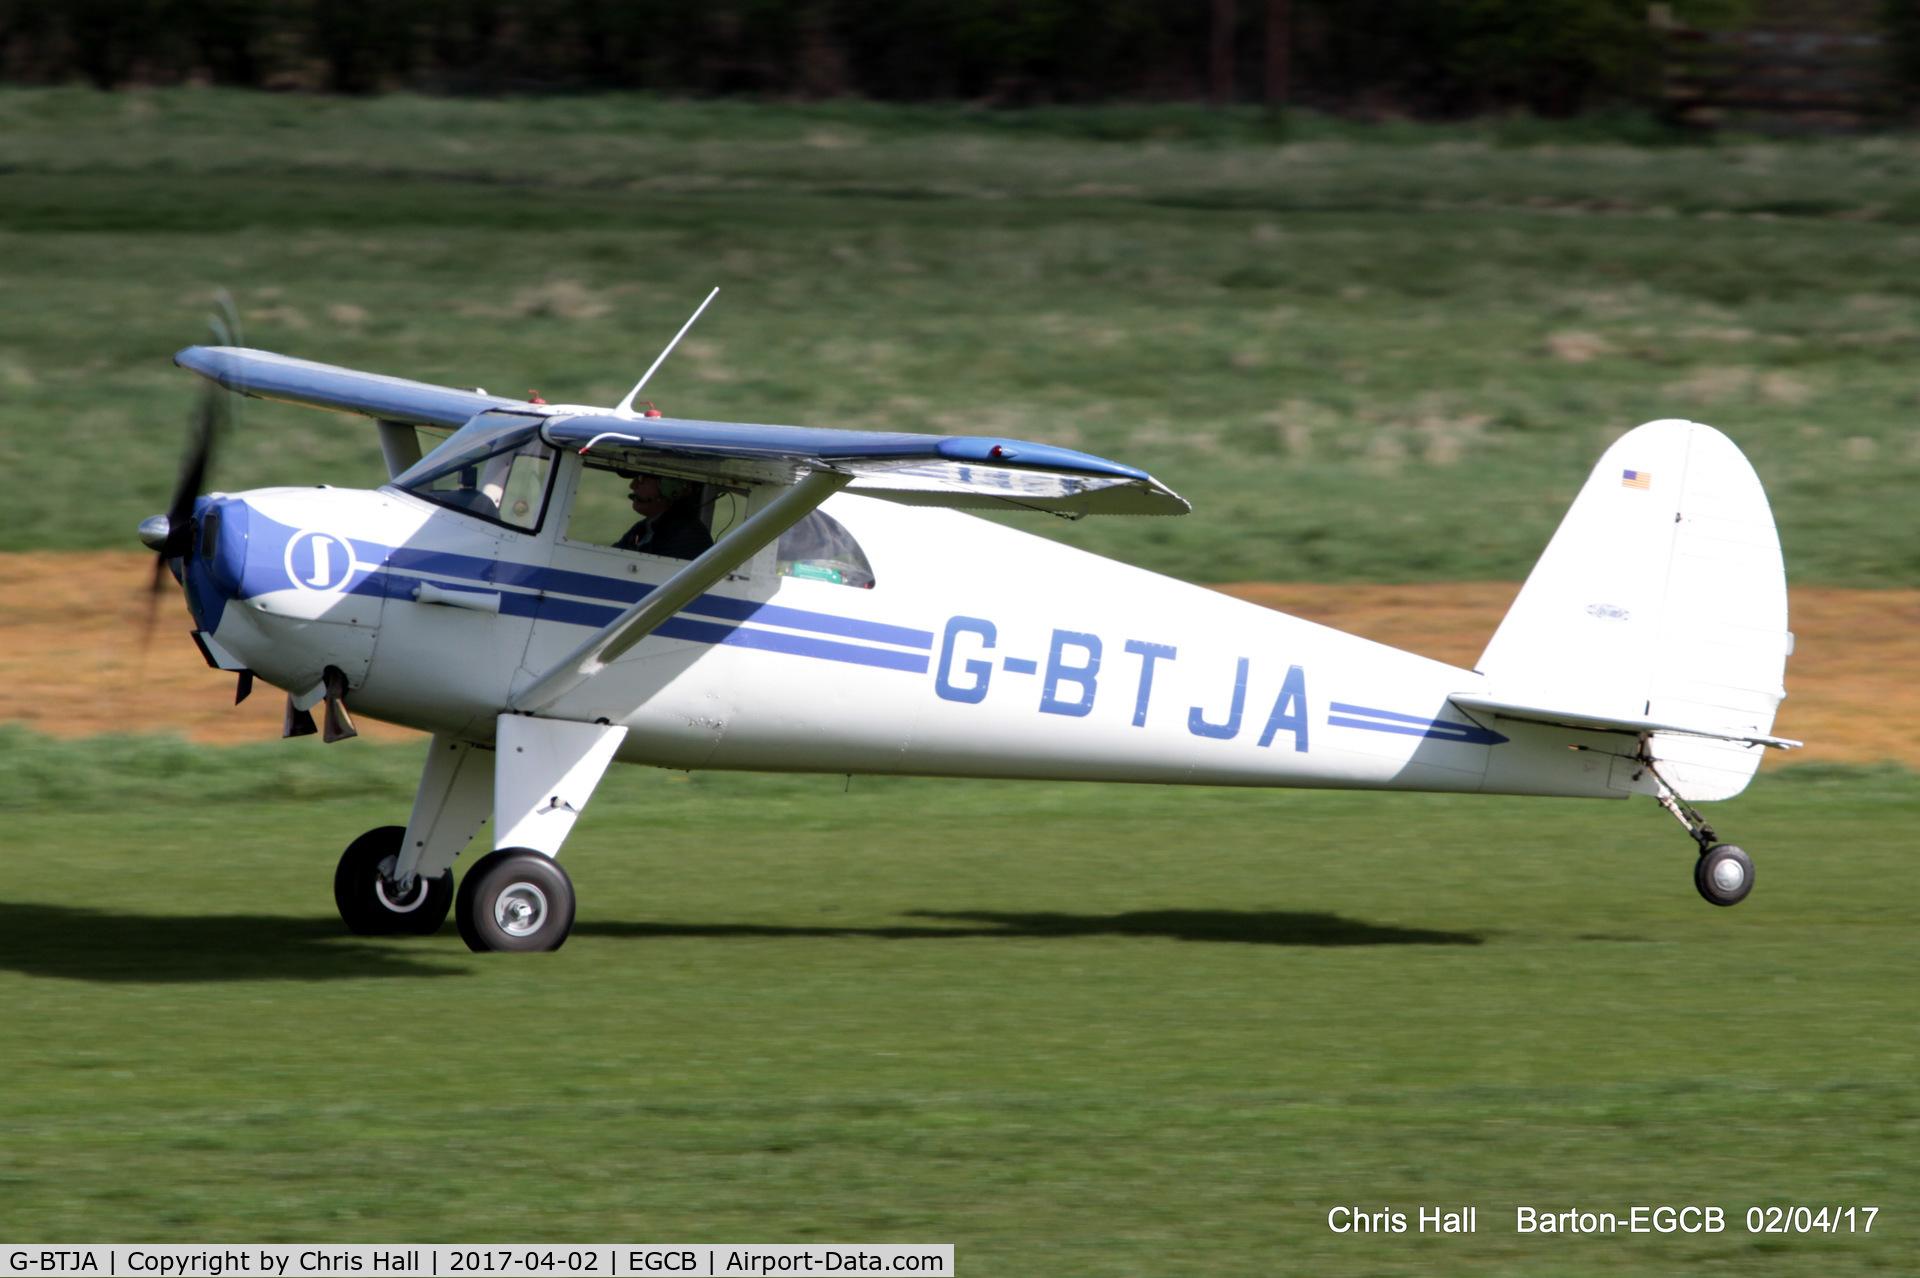 G-BTJA, 1947 Luscombe 8E Silvaire C/N 5037, at Barton